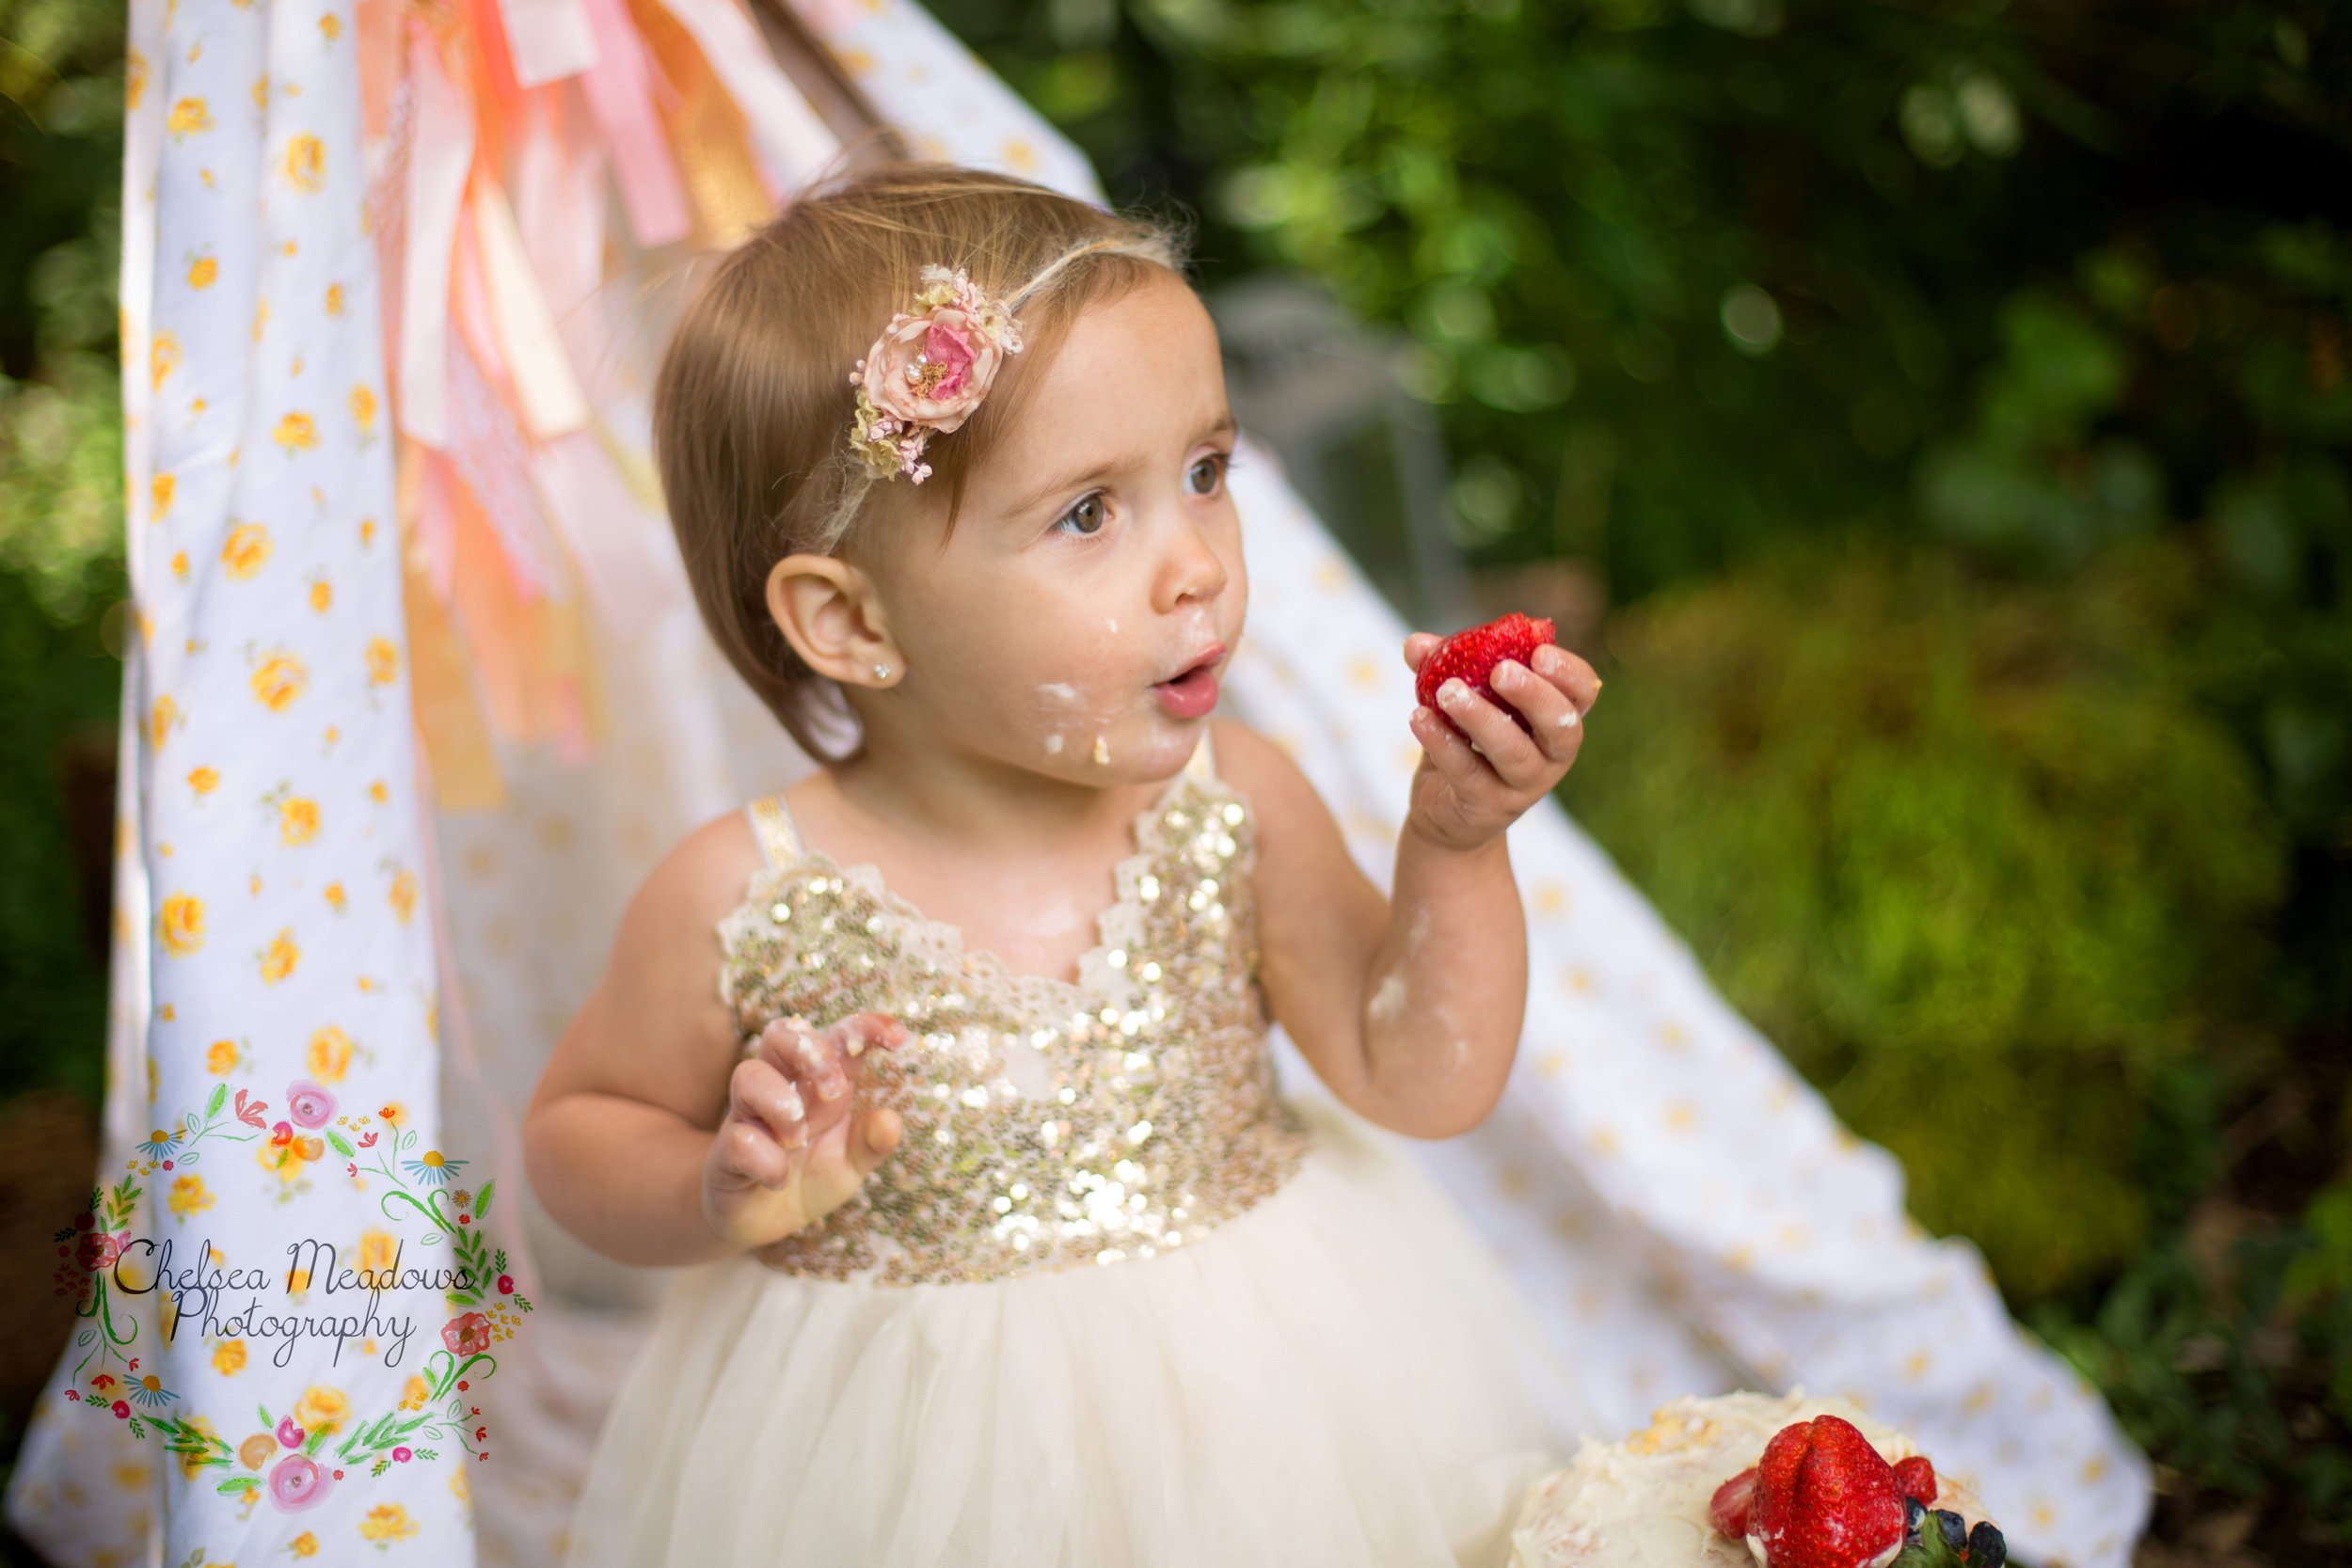 Paisley First Birthay Cake Smash - Nashville Family Photographer - Chelsea Meadows Photography (3).jpg